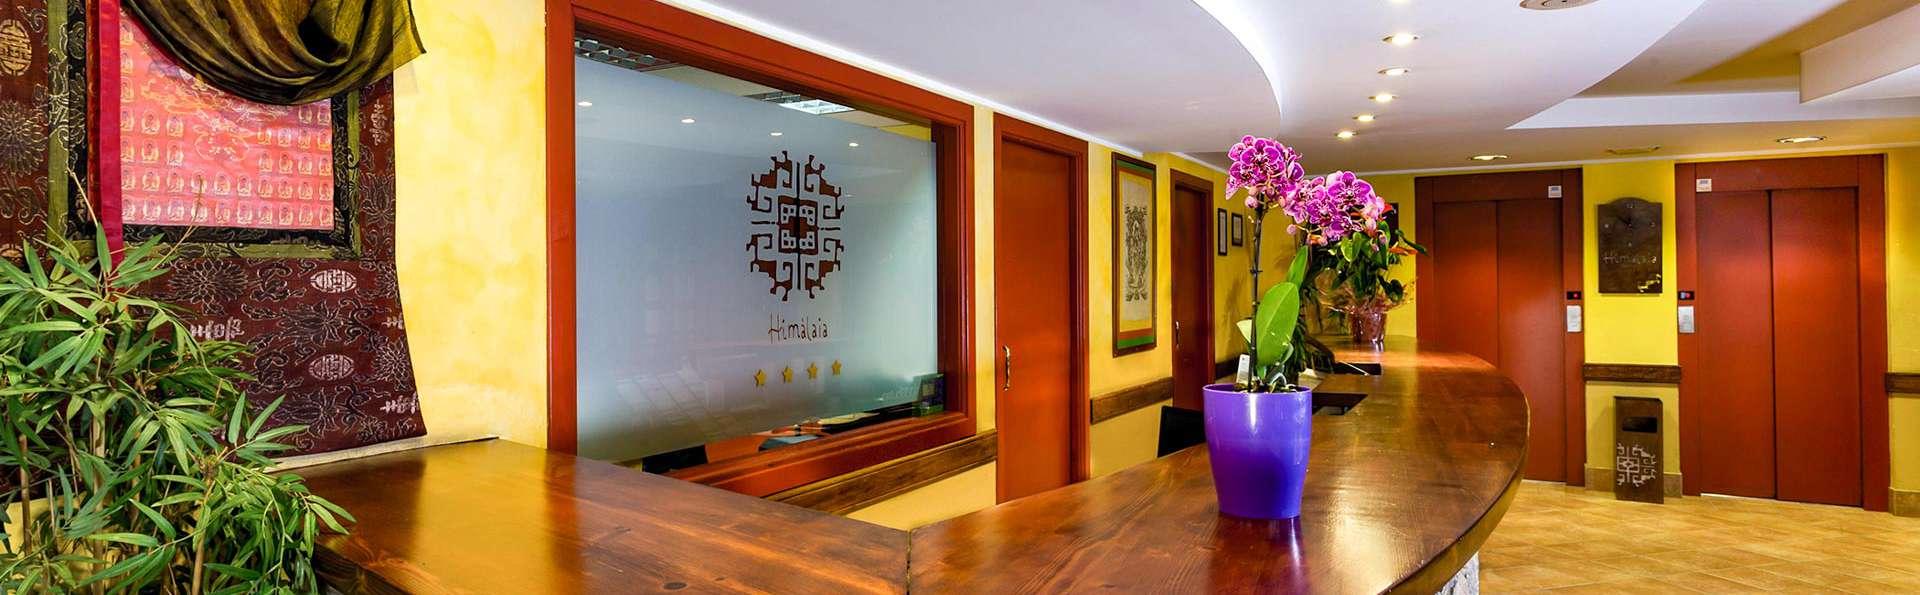 Hotel Himàlaia Soldeu - EDIT_LOBBY_01.jpg